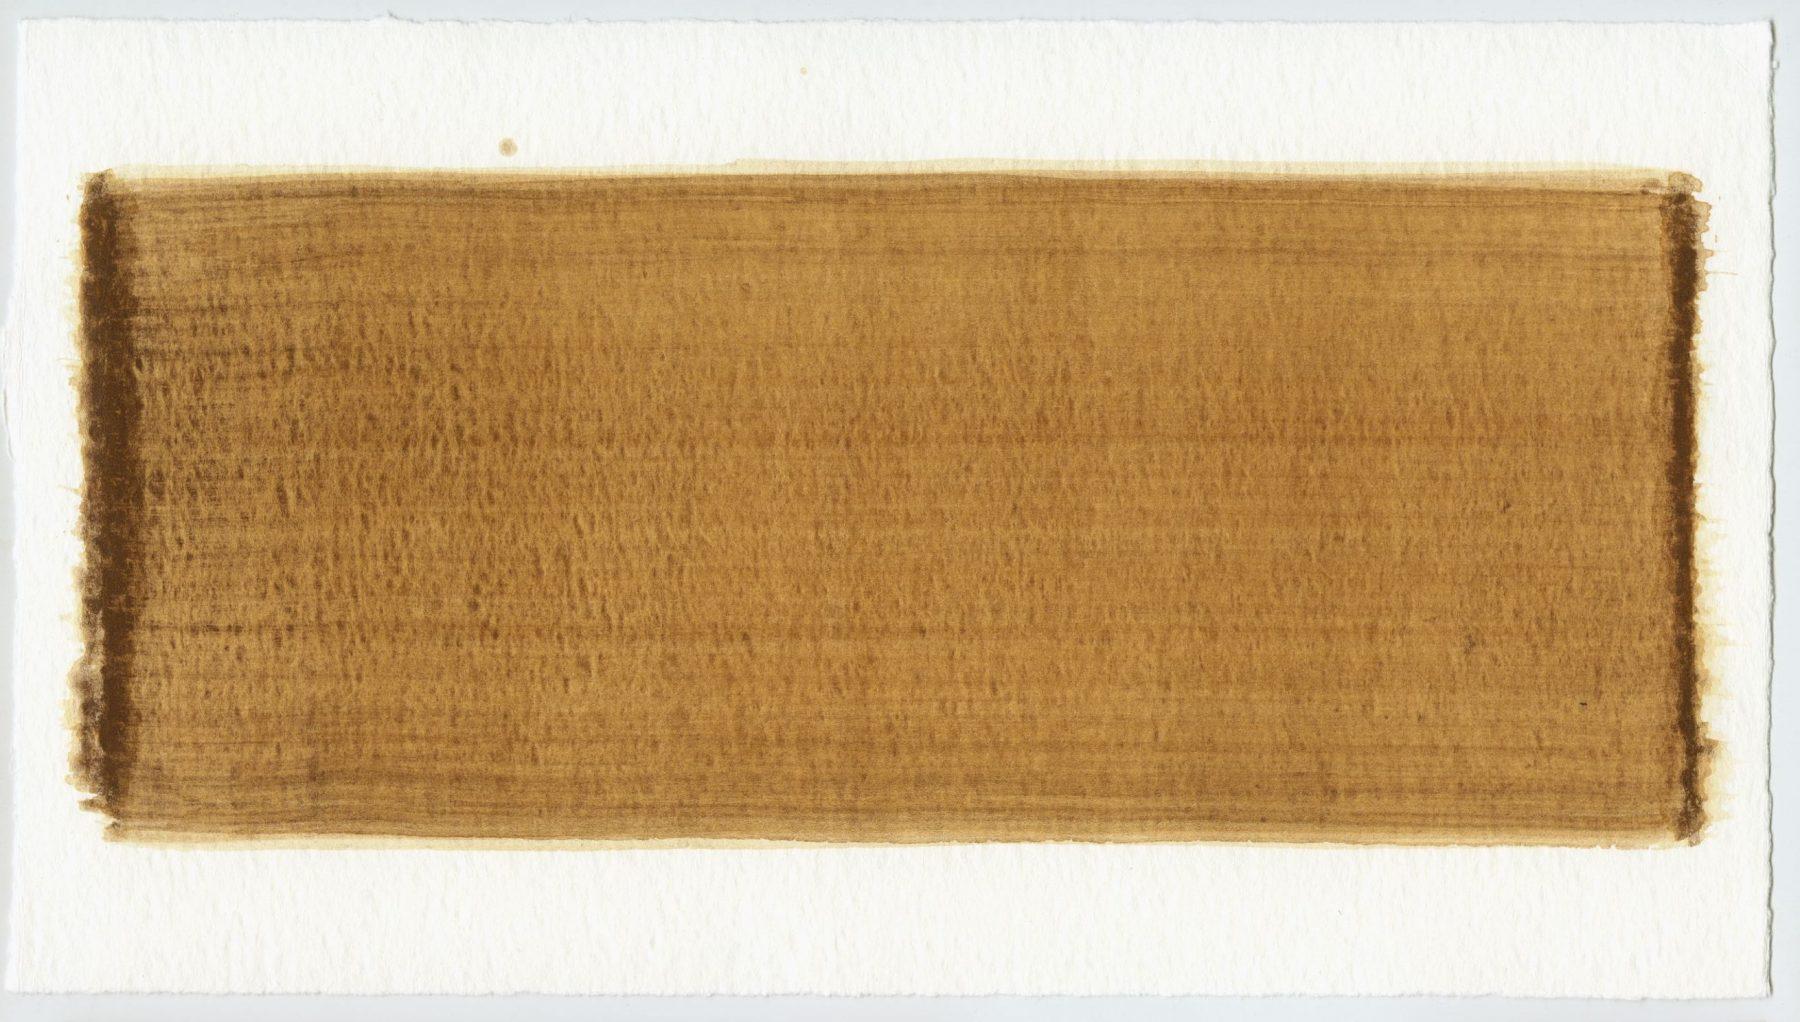 Brush stroke no. 96 - Selfmade pigment: IJzeroer